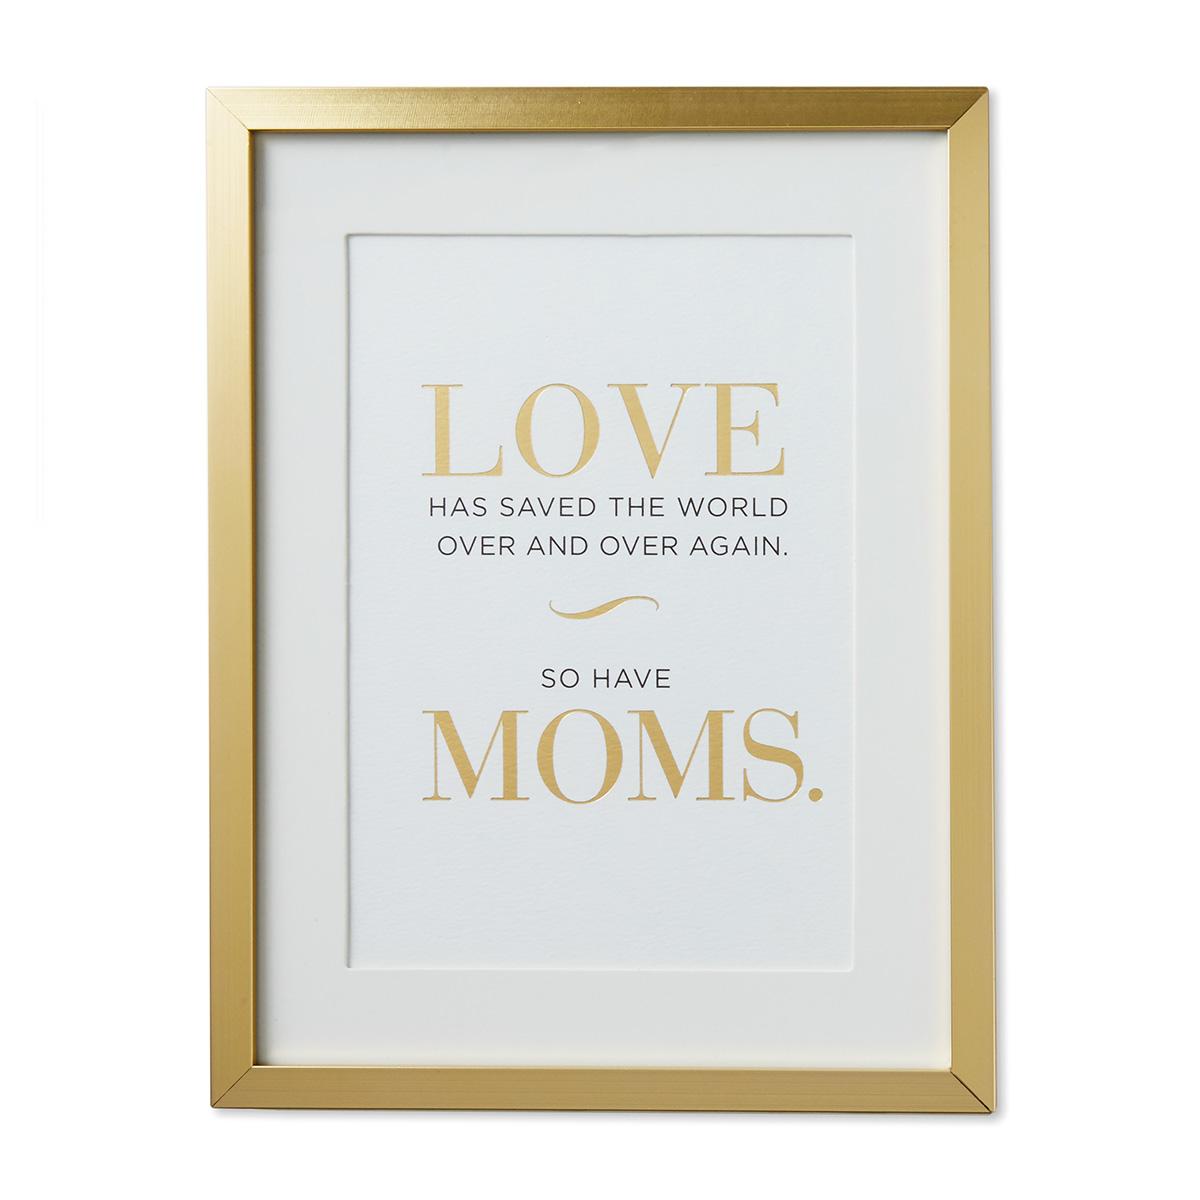 Moms Save the World Framed Print